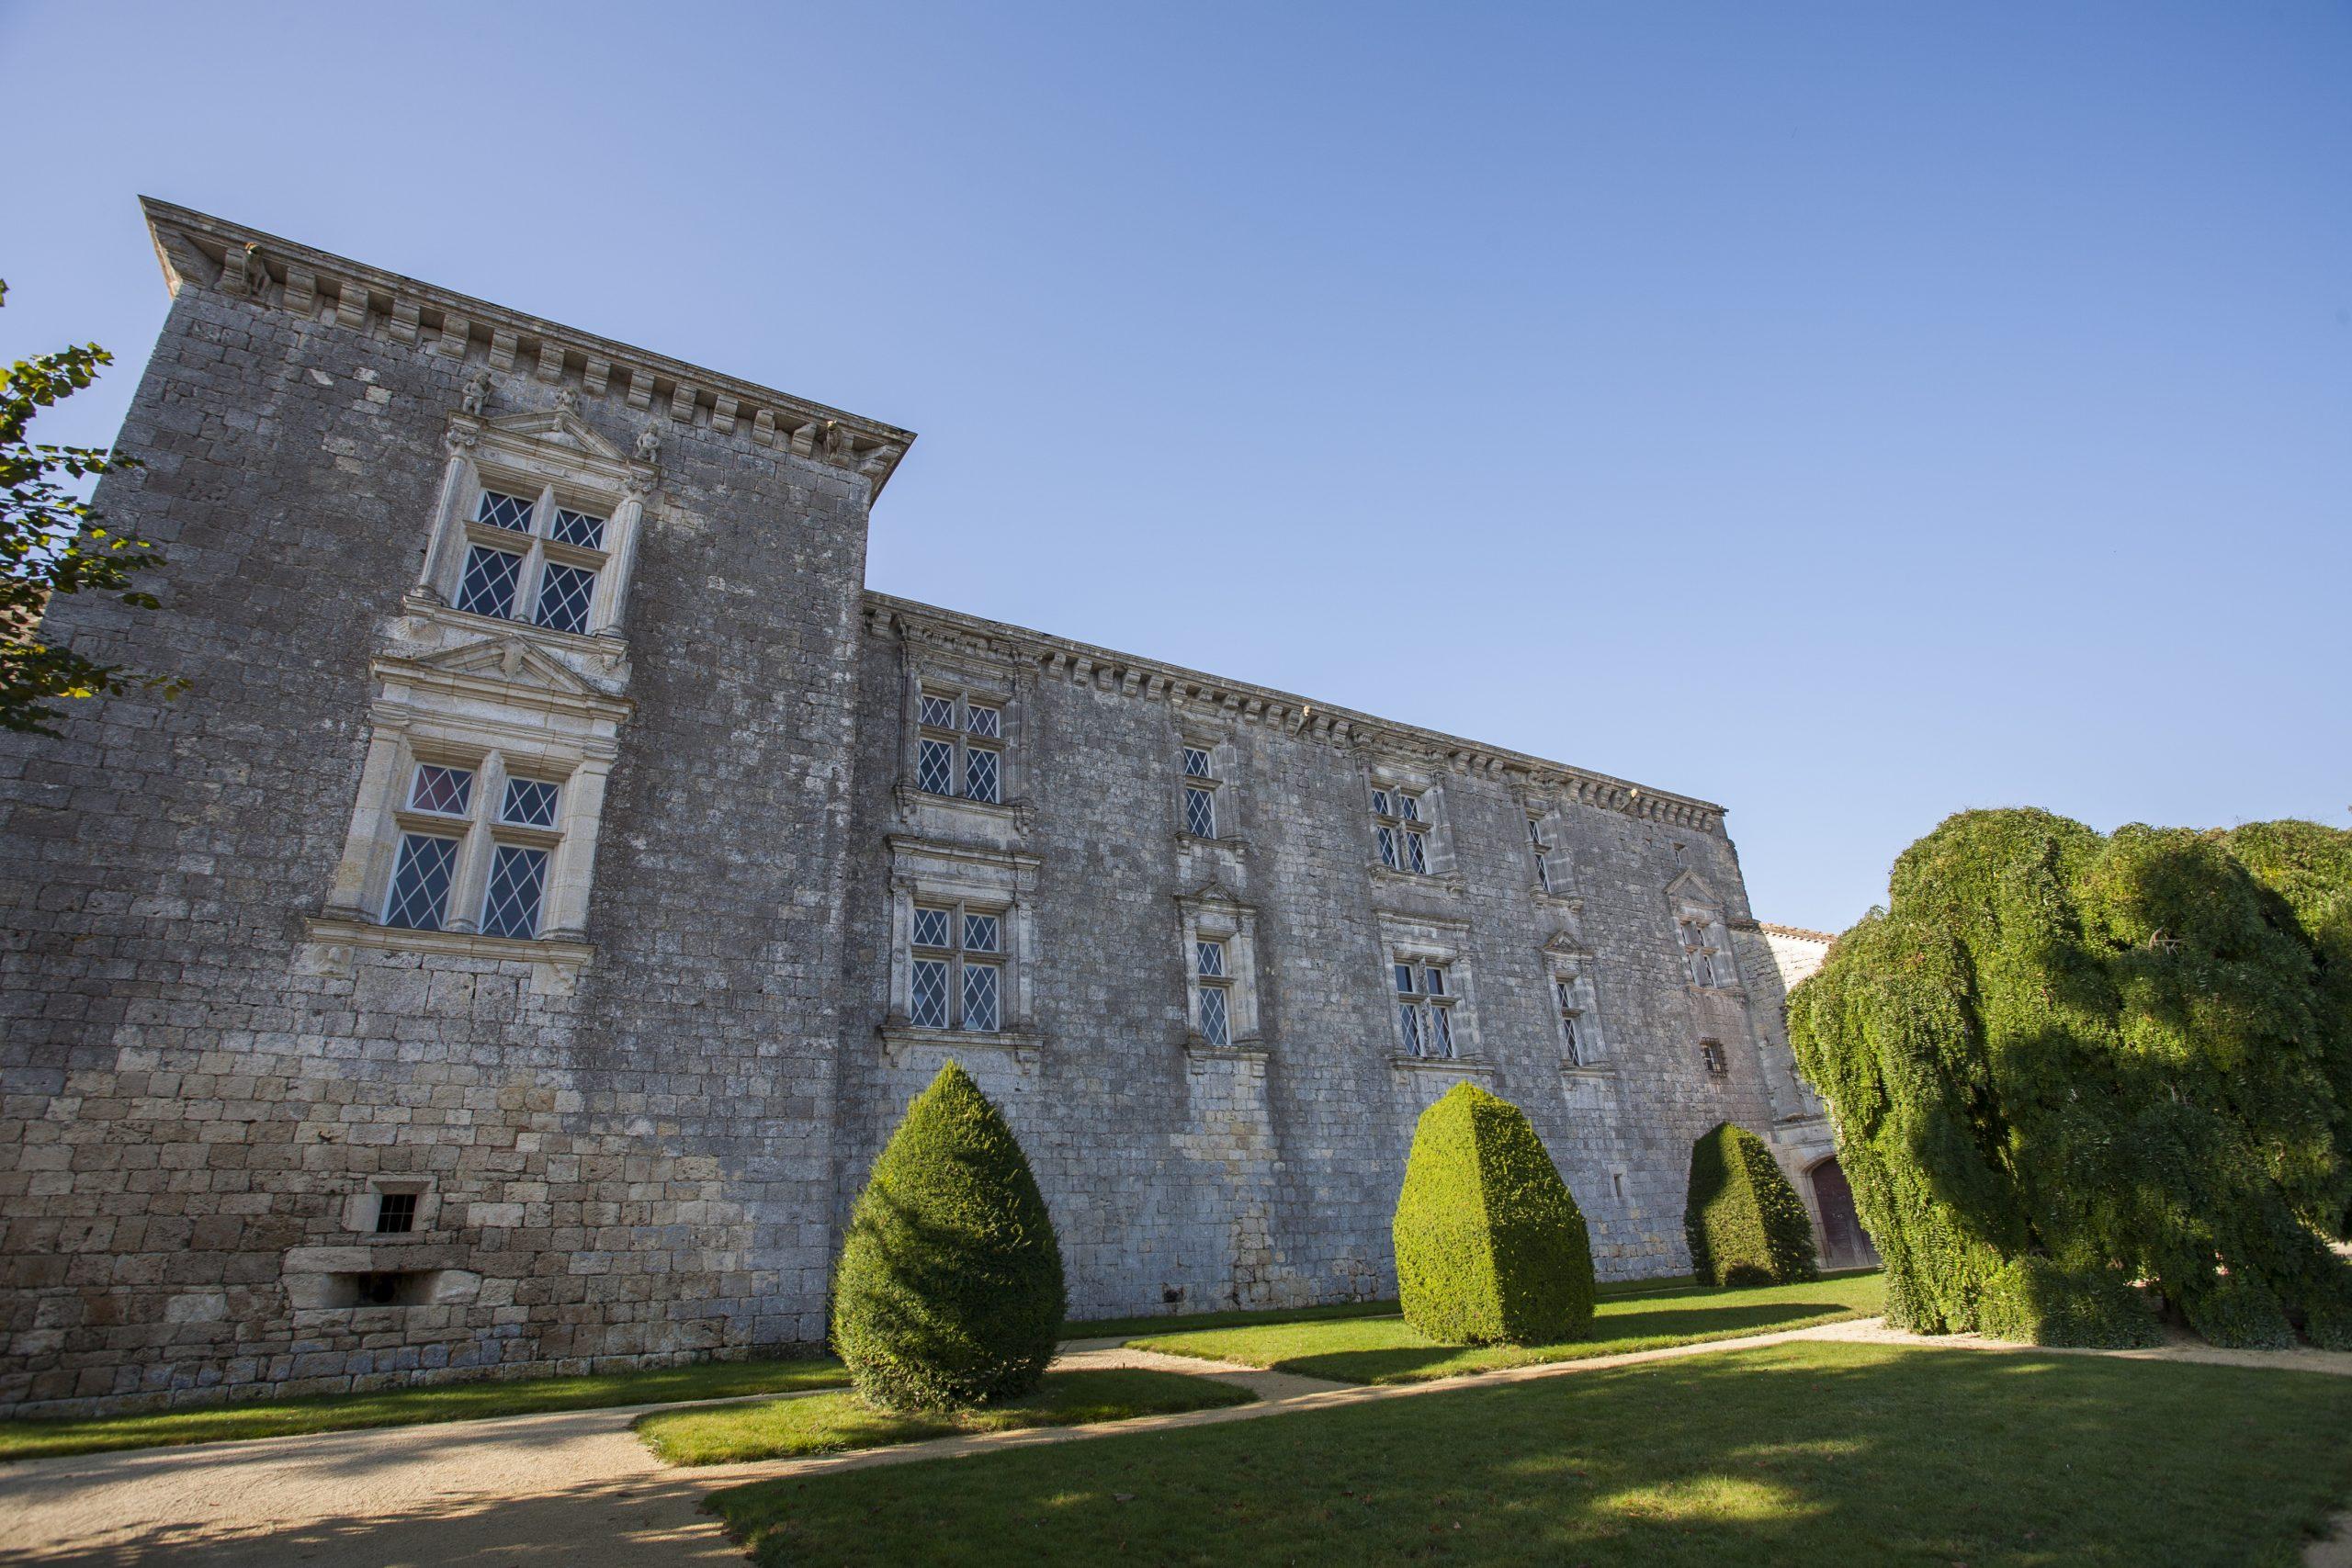 Facade Renaissance château de Gramont